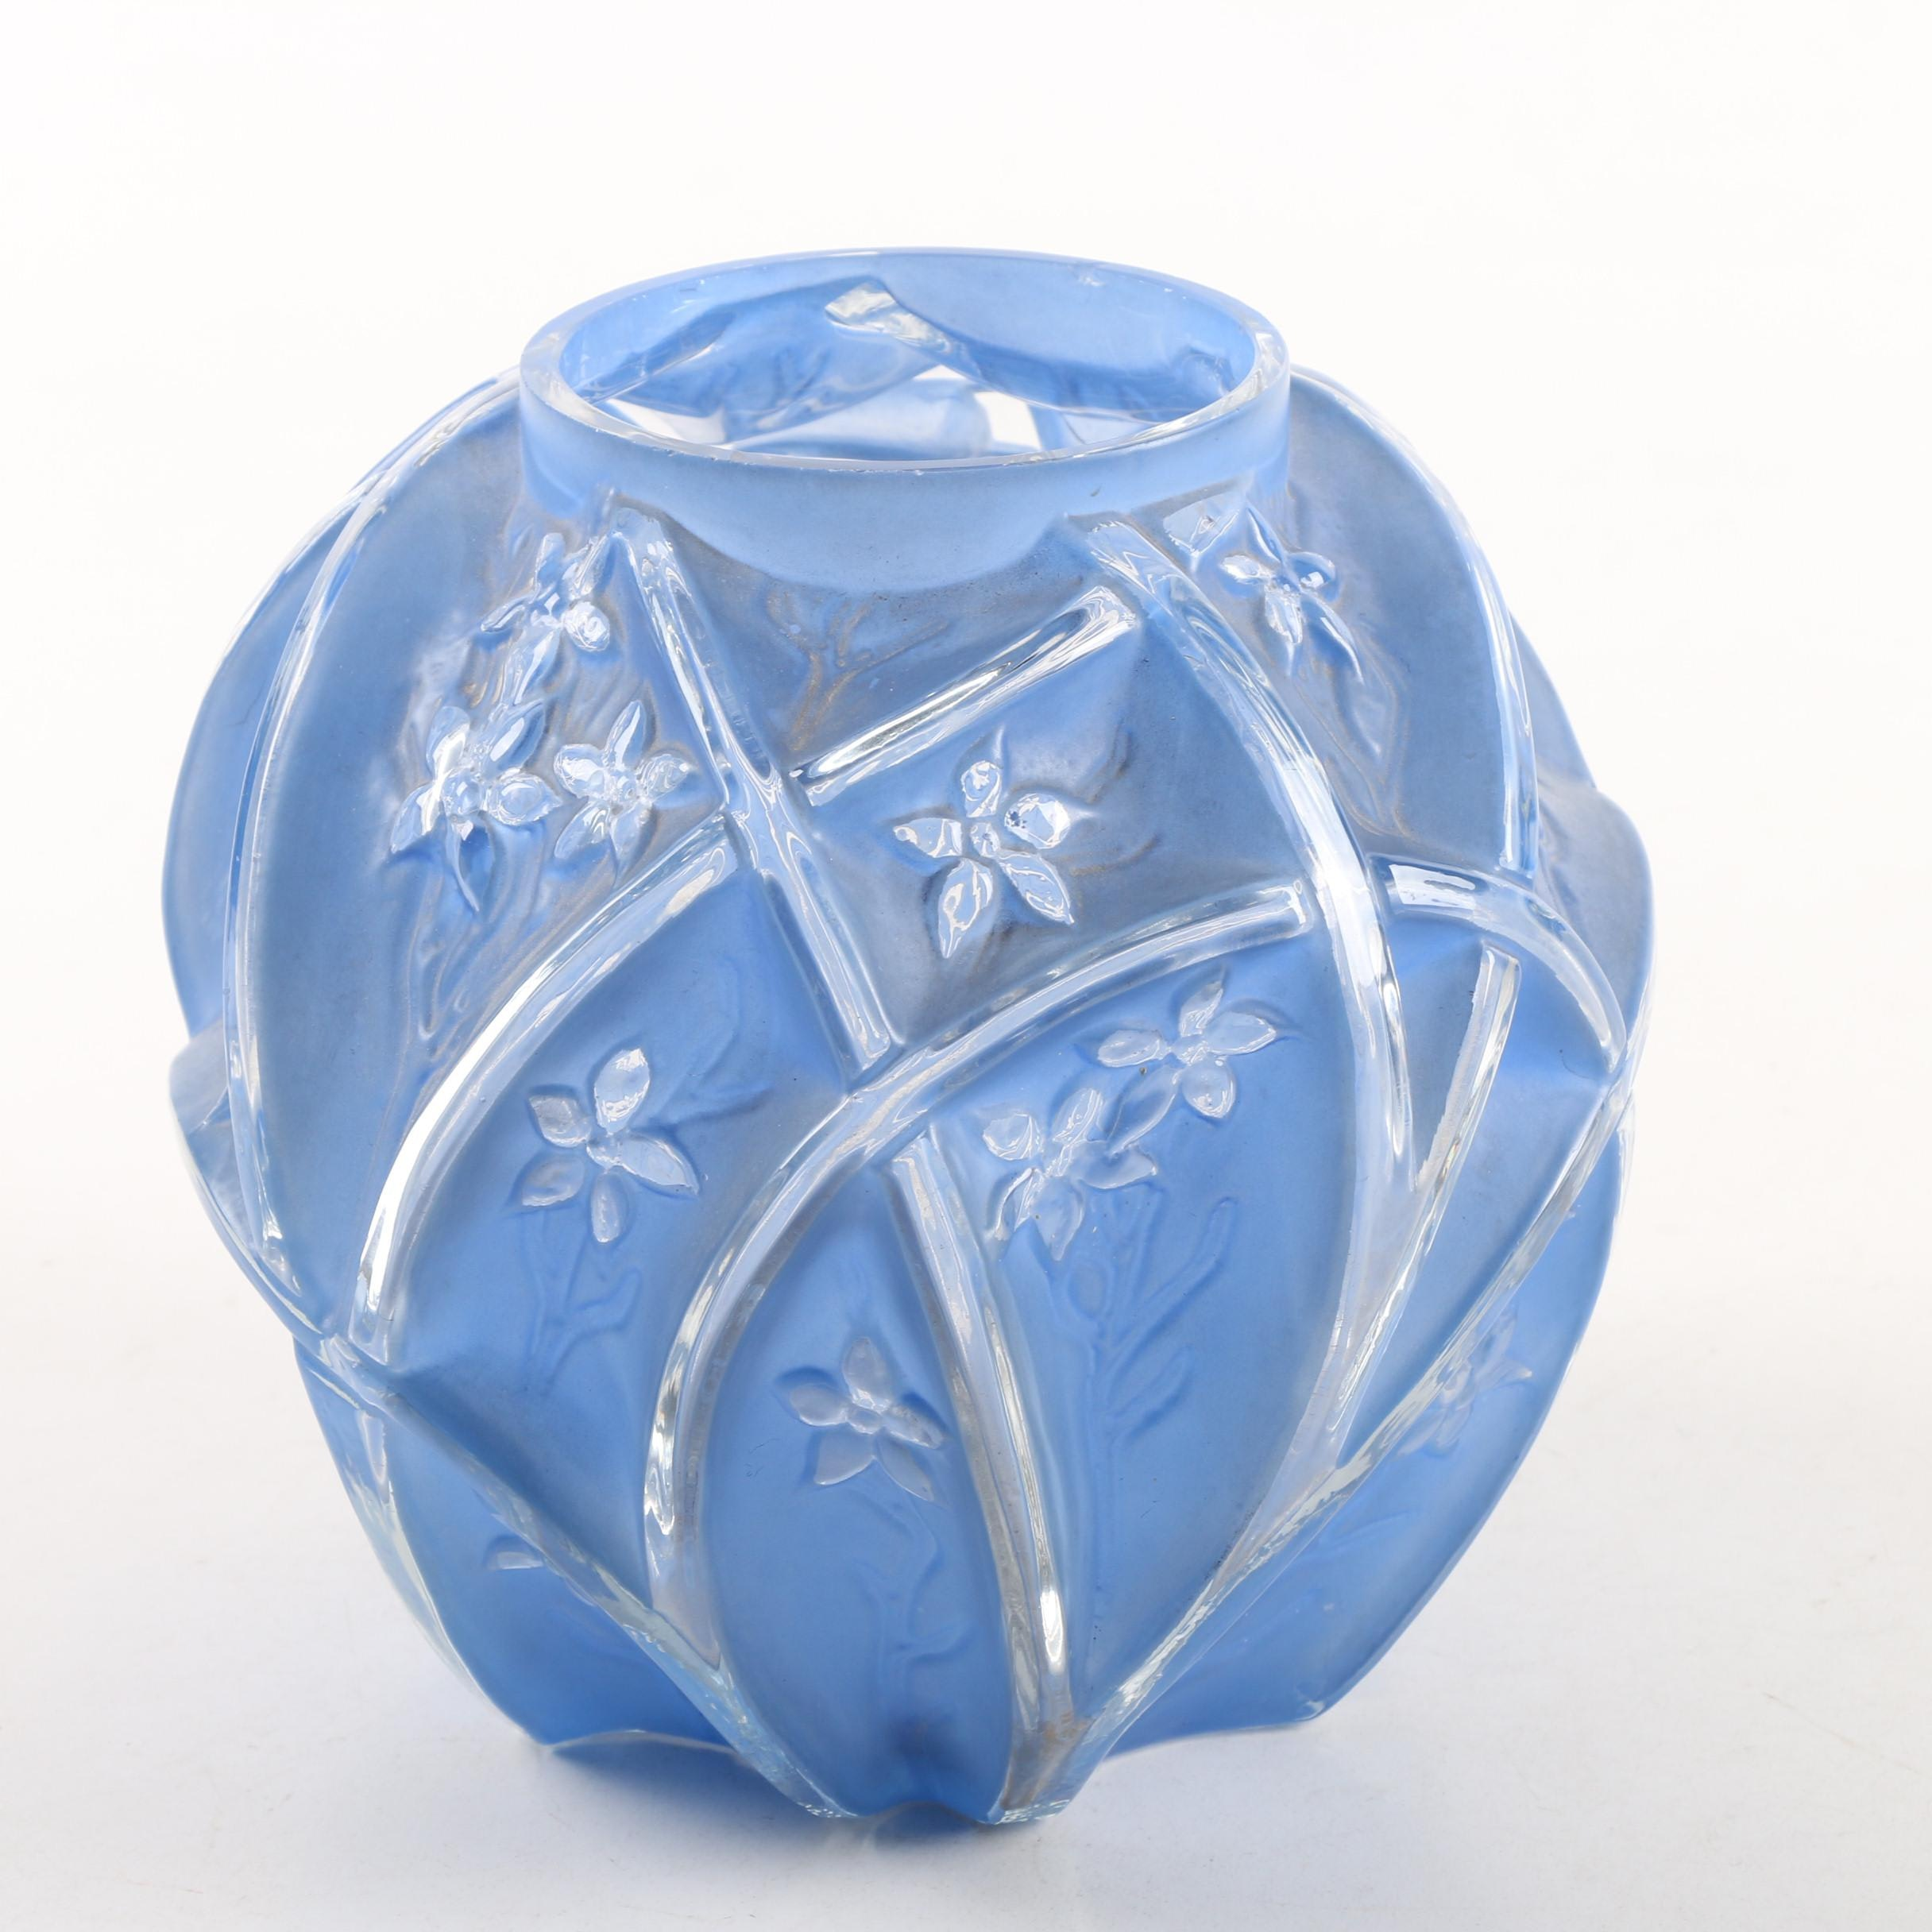 Floral Blue Frosted Glass Vase